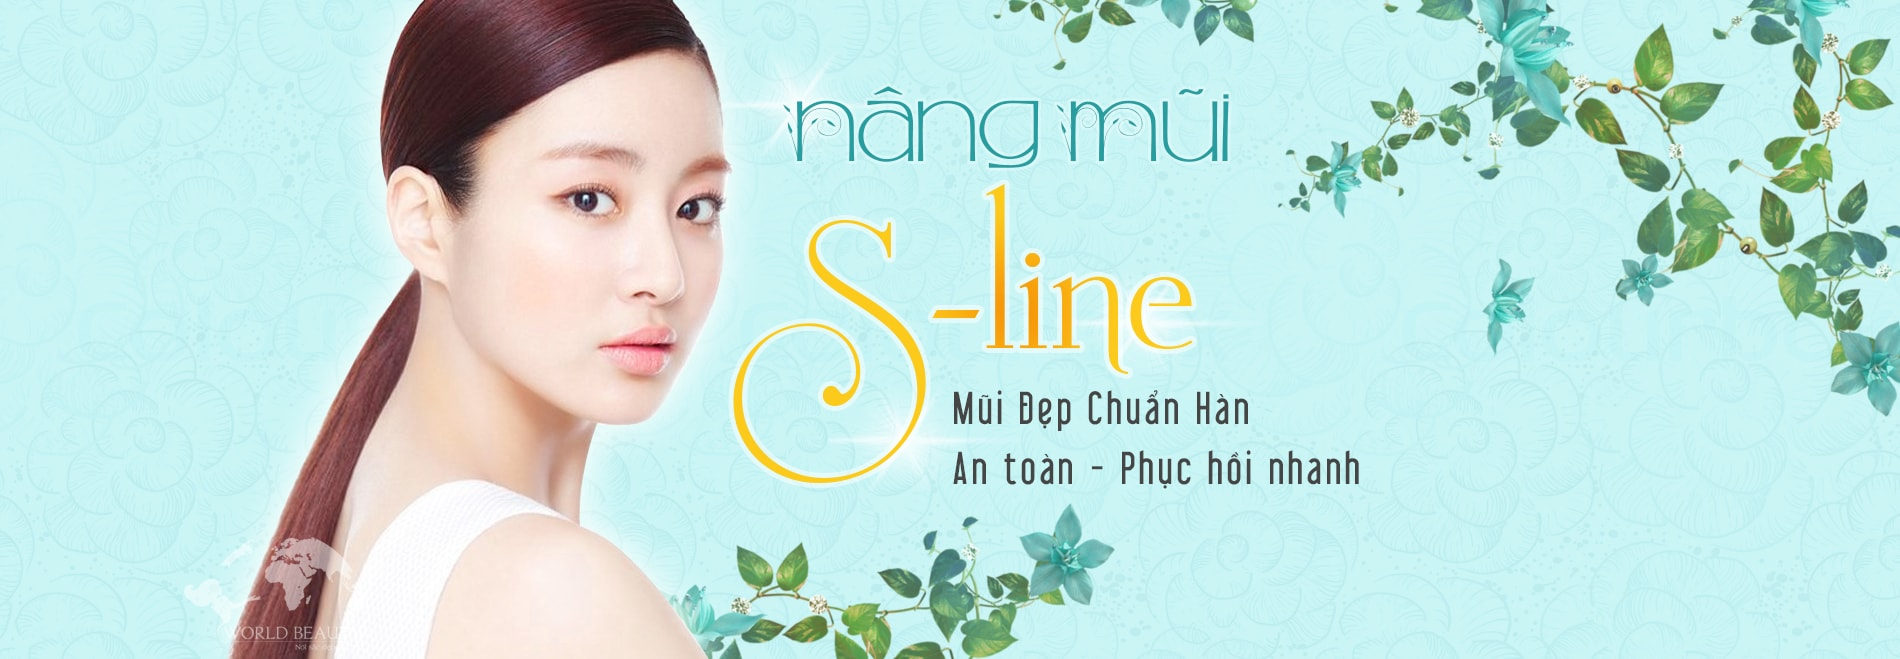 Nang-Mui-Sline-TheGioiDep-min